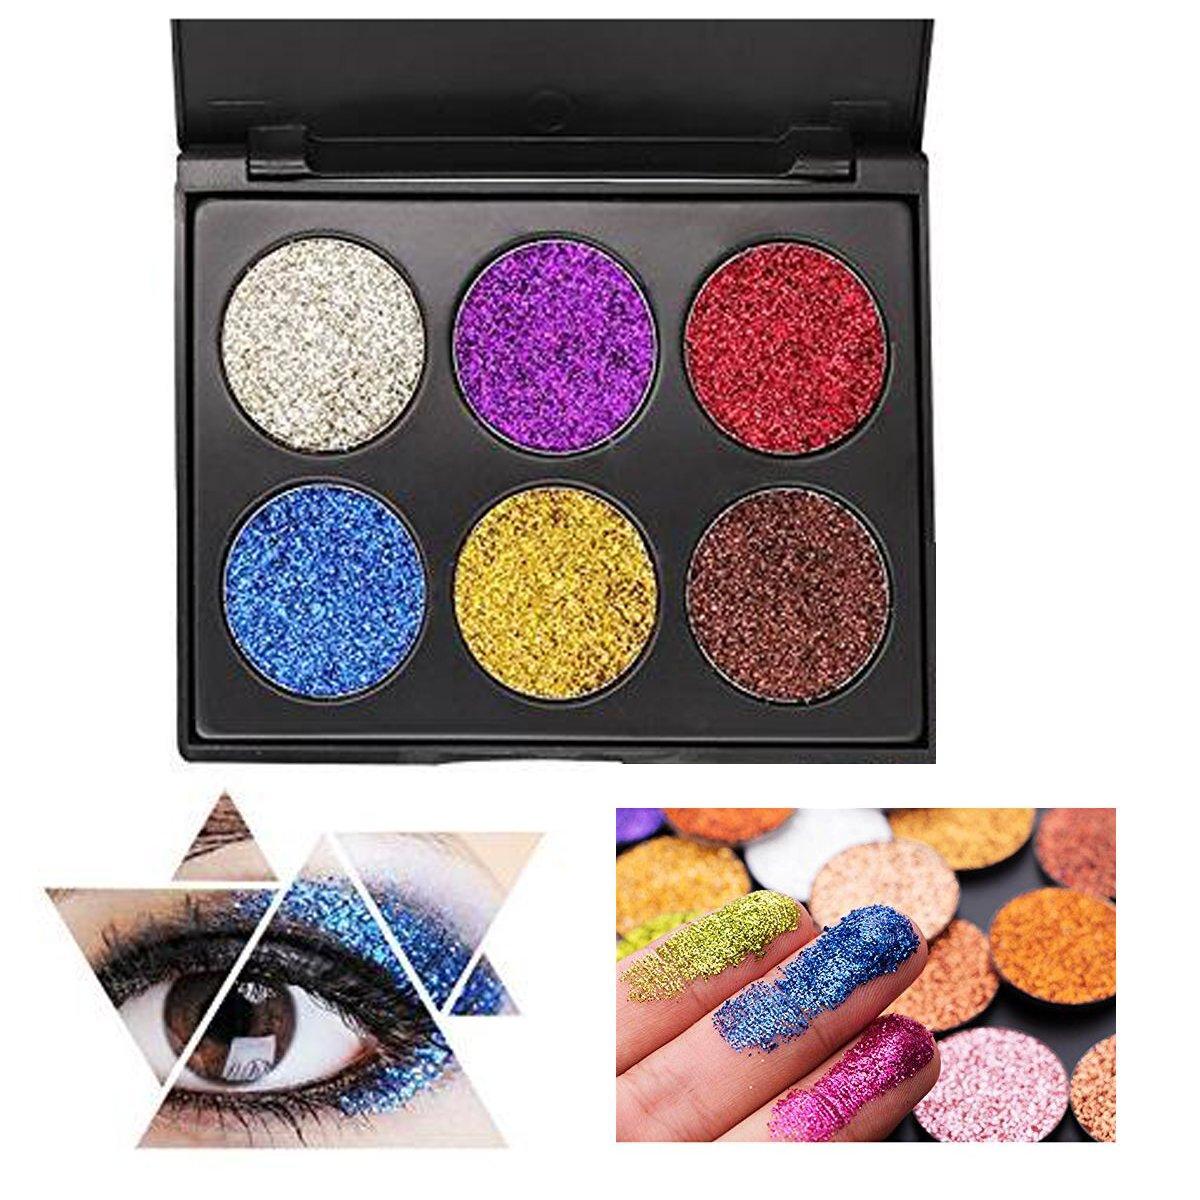 Glitter Eyeshadow, YHMWAX 6 Color Shimmer Ultra Pigmented Makeup Eye Eyeliner Cosmetic Eye Shadow Diamond Shiny Shimmer, Silky Smooth & Long Lasting (EFK02)